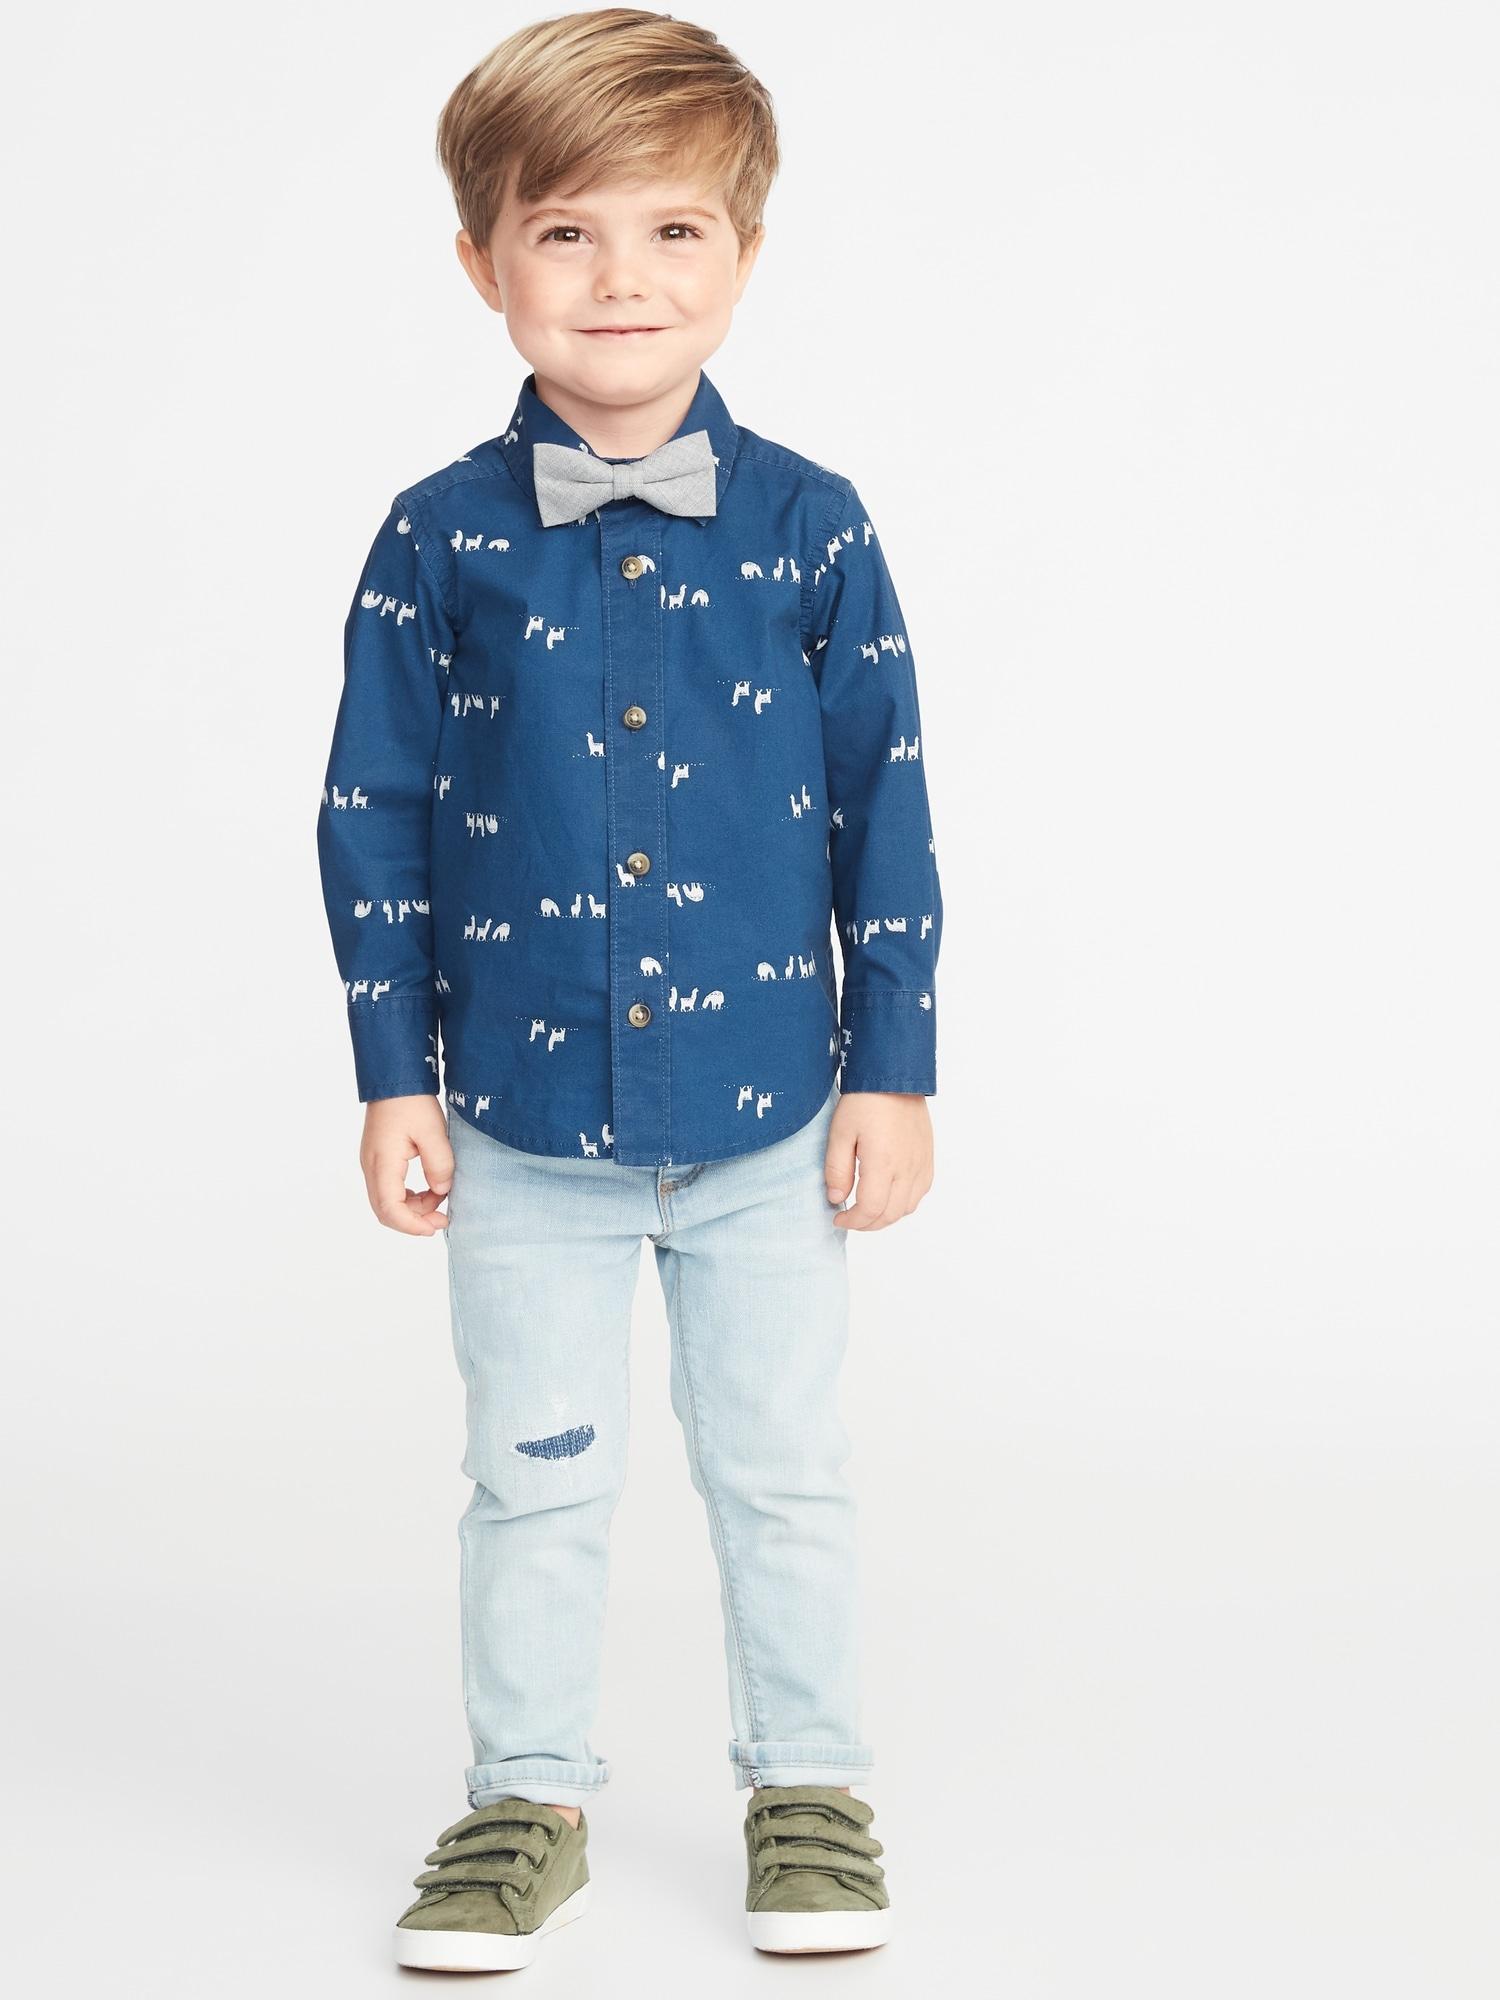 2ec79dd75 Printed Shirt   Bow-Tie Set for Toddler Boys